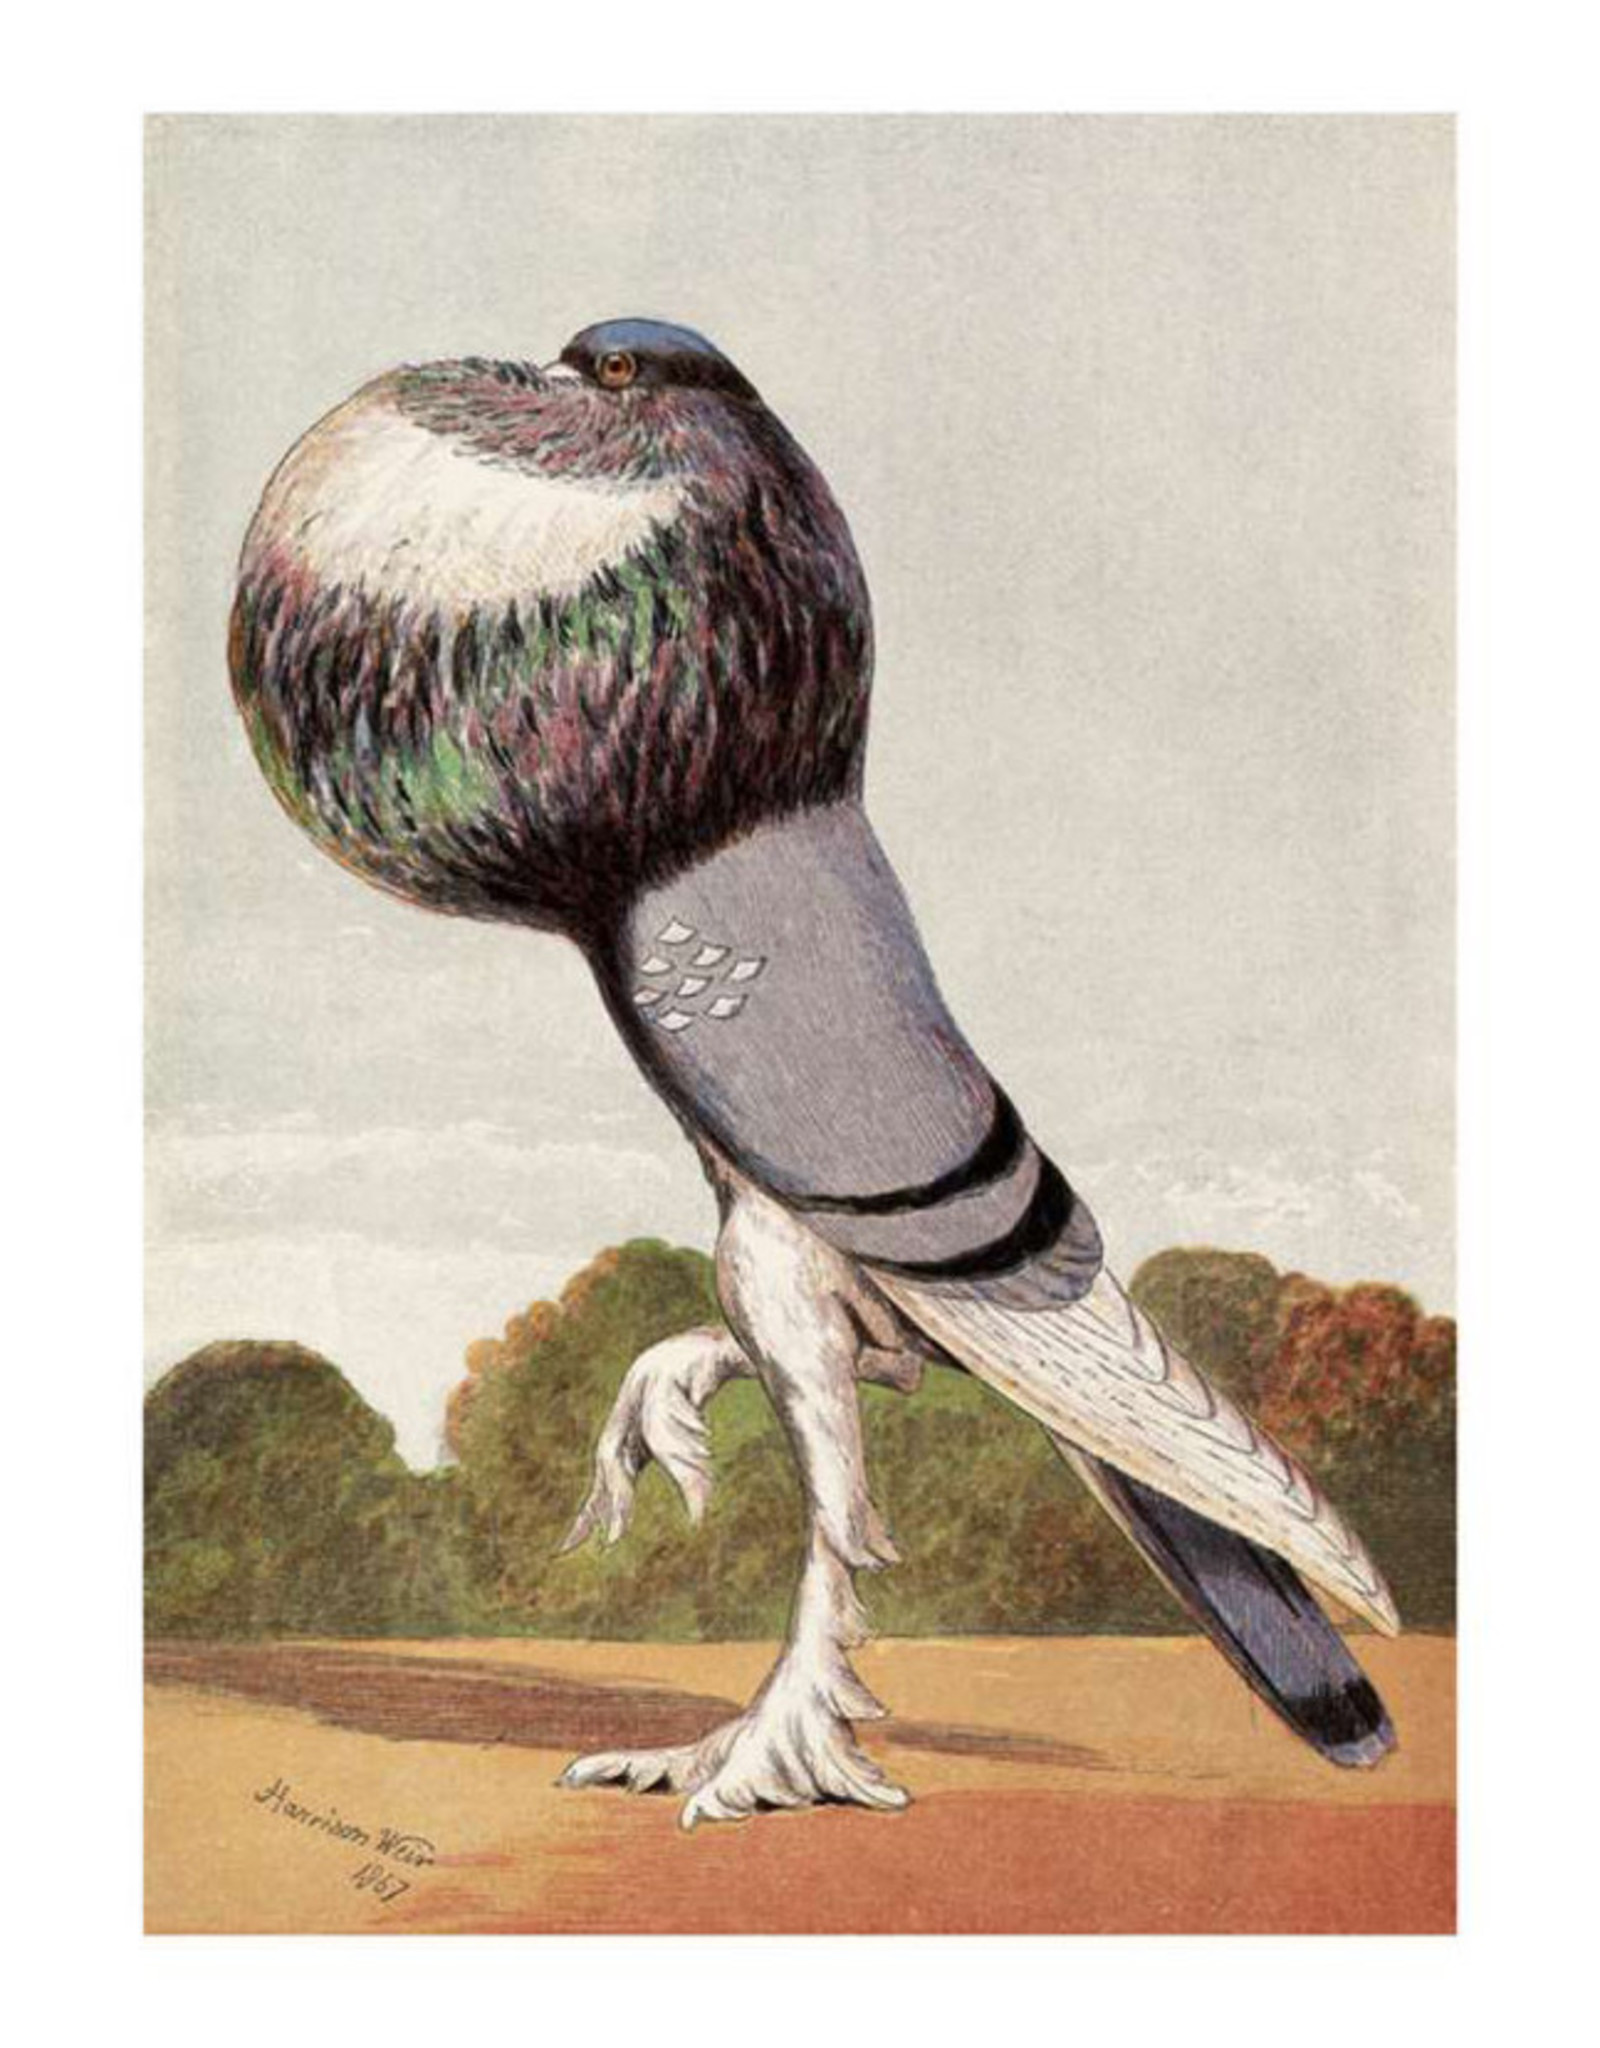 Pomegranate Harrison Weir: Blue Pouter Postcard